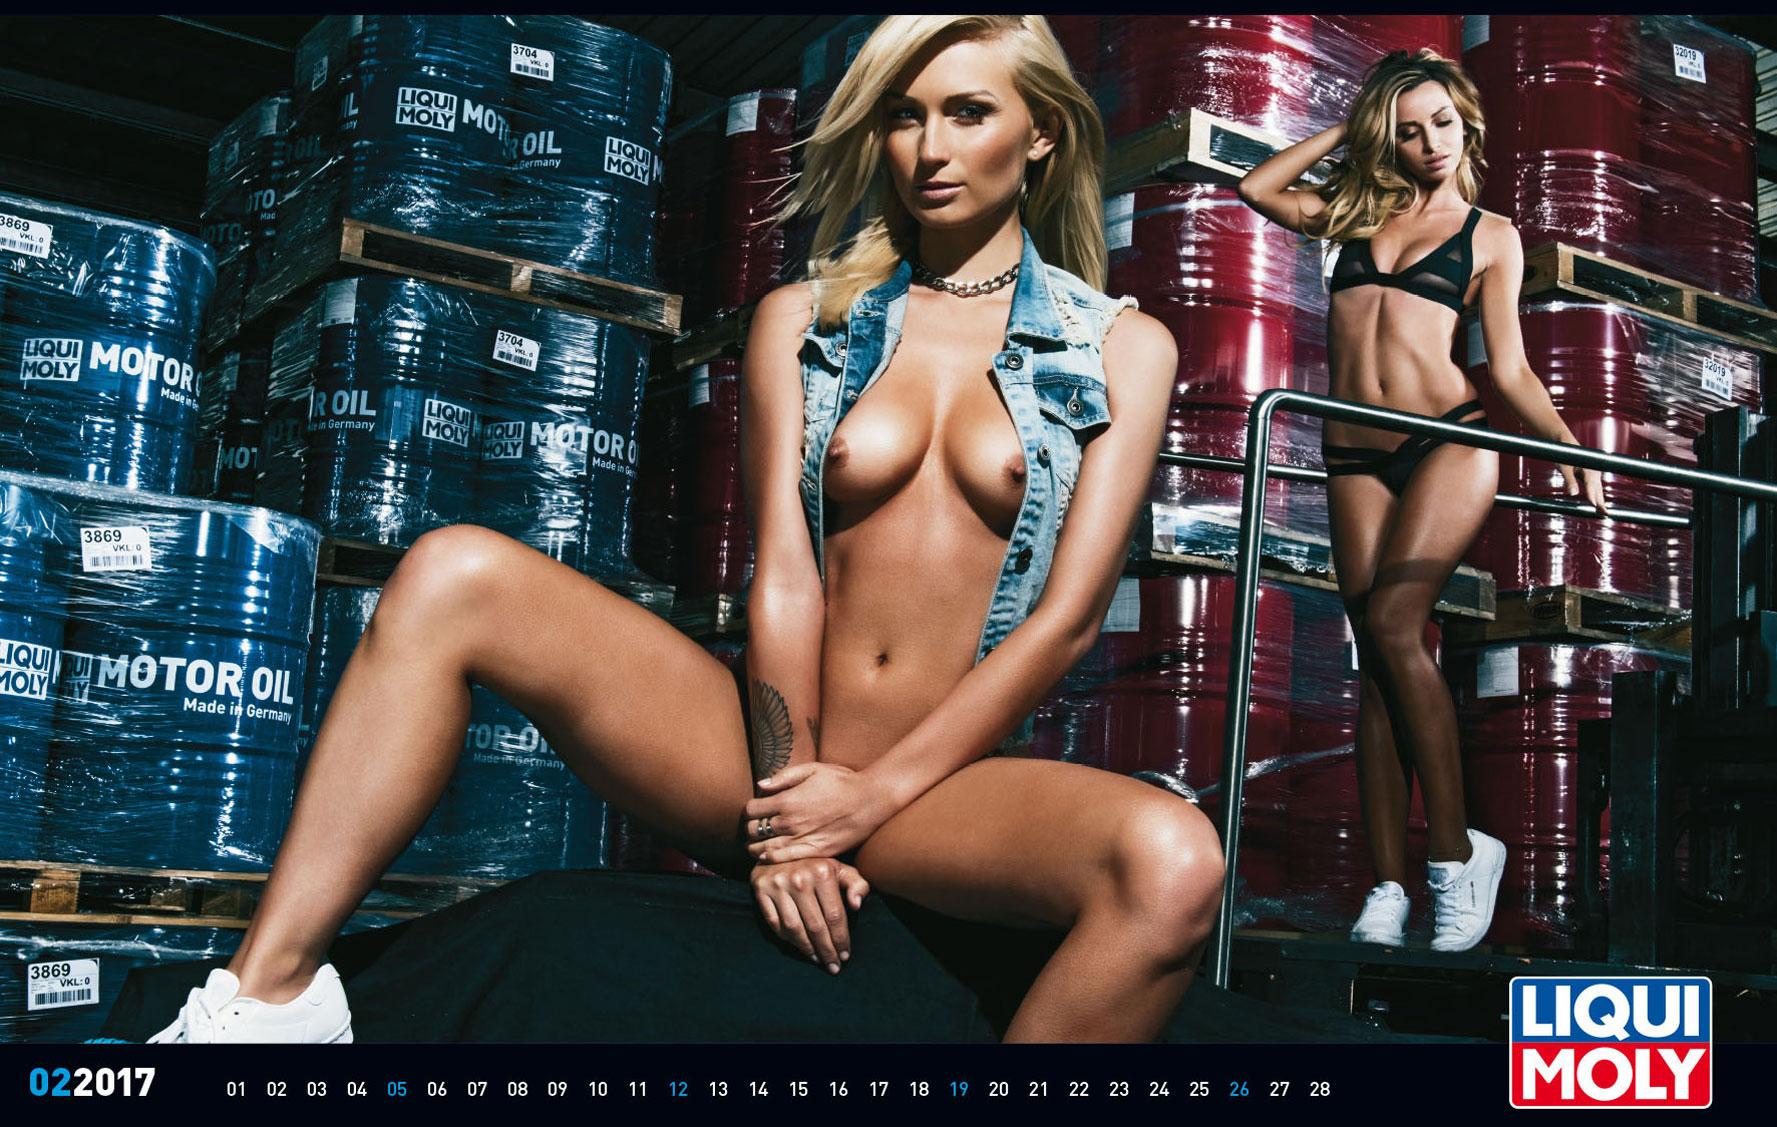 Liqui Moly 2017 calendar nude version.